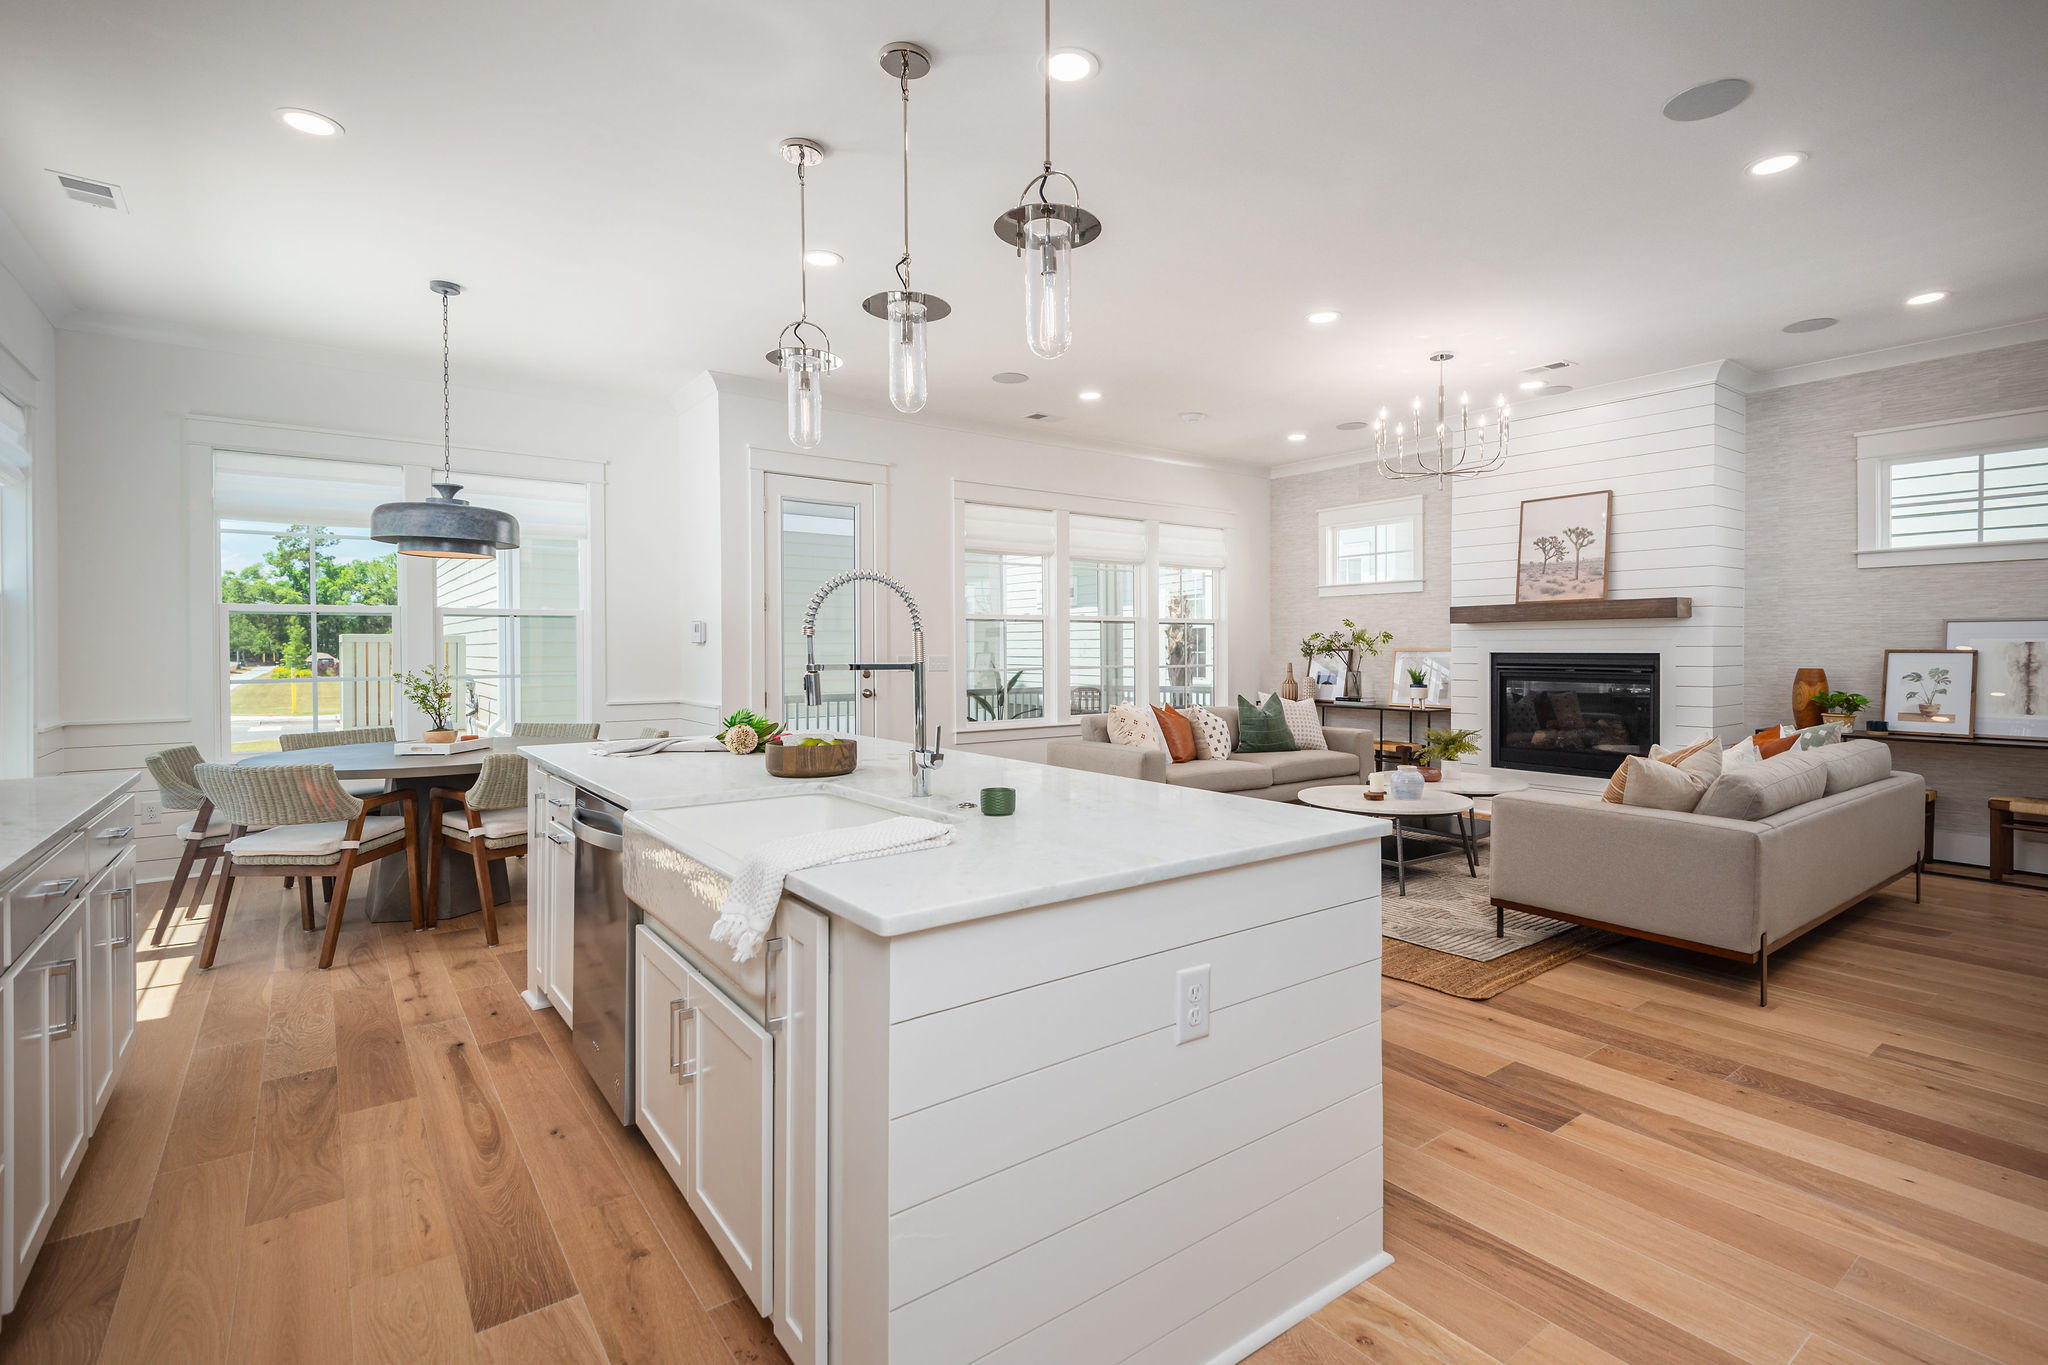 Midtown Homes For Sale - 1533 Kepley, Mount Pleasant, SC - 58